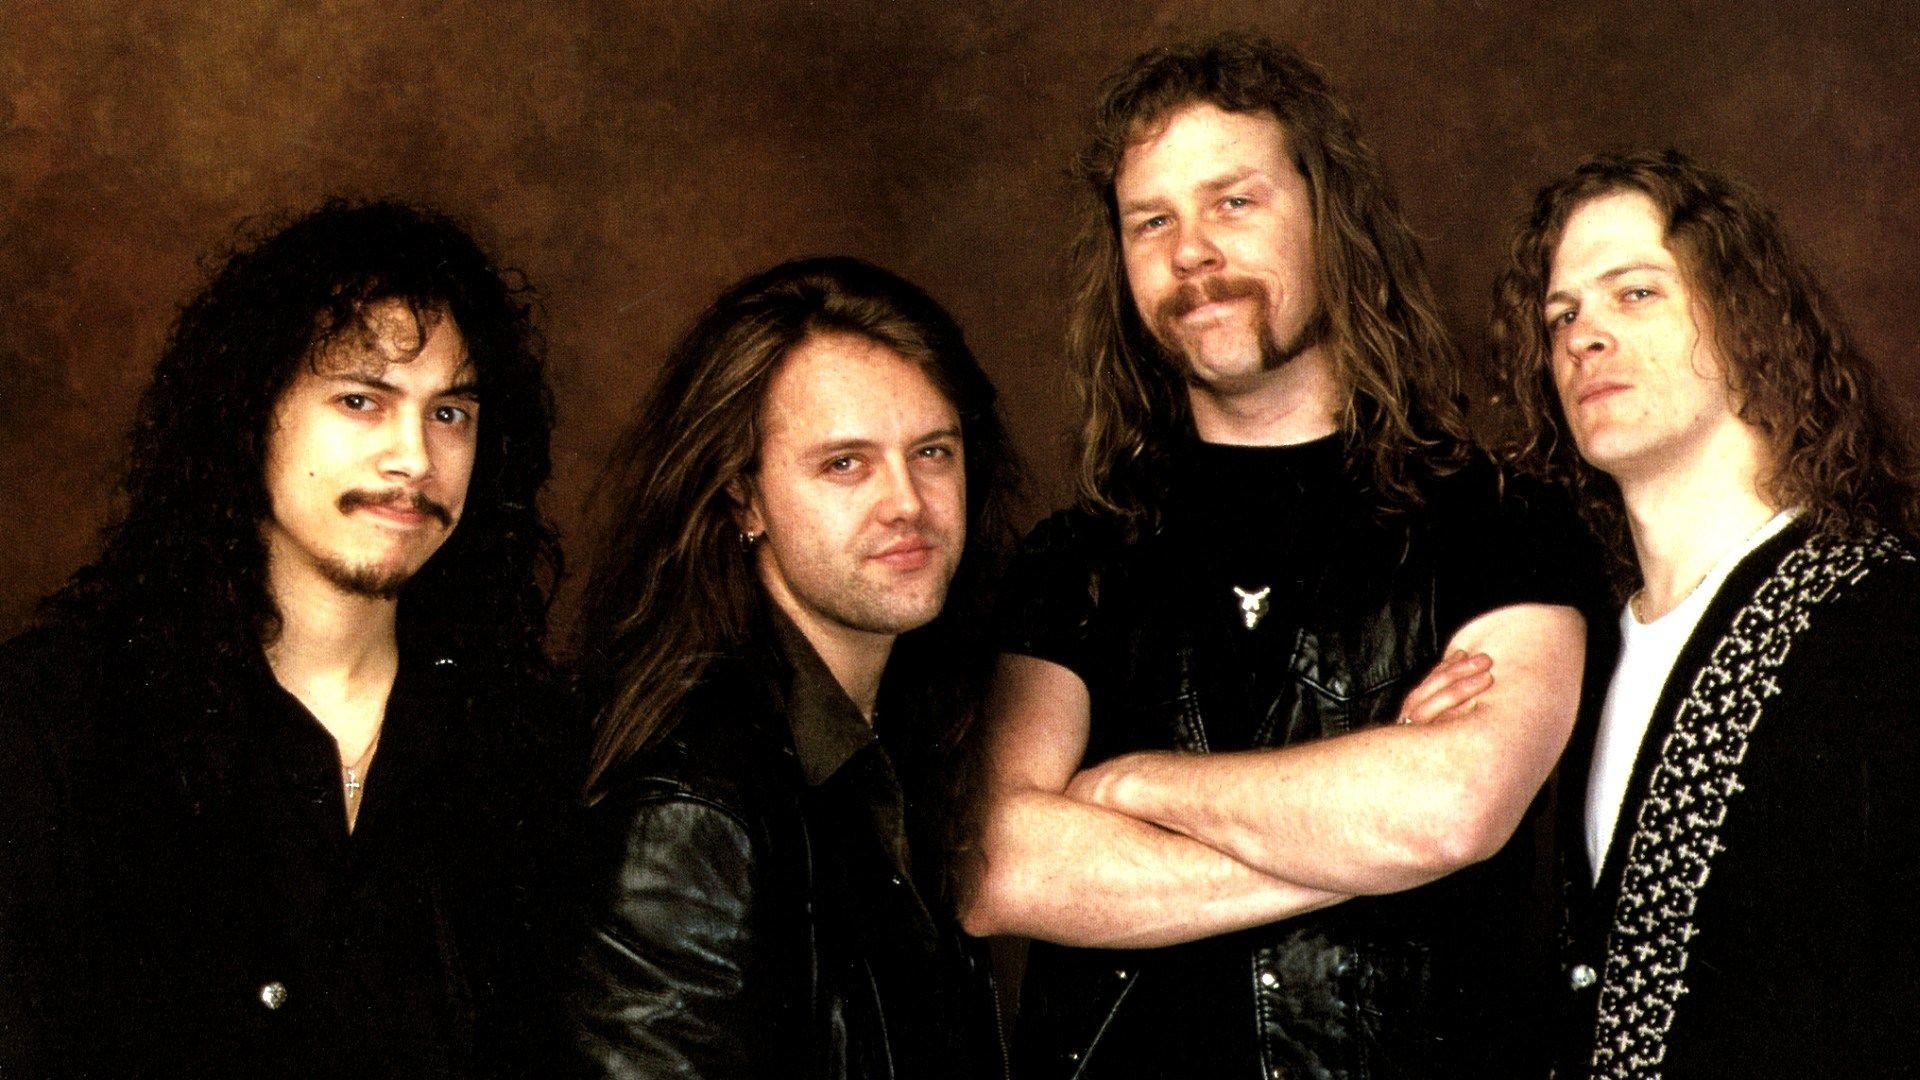 Res: 1920x1080, Metallica bands groups music entertainment heavy metal hard rock thrash  wallpaper |  | 25007 |